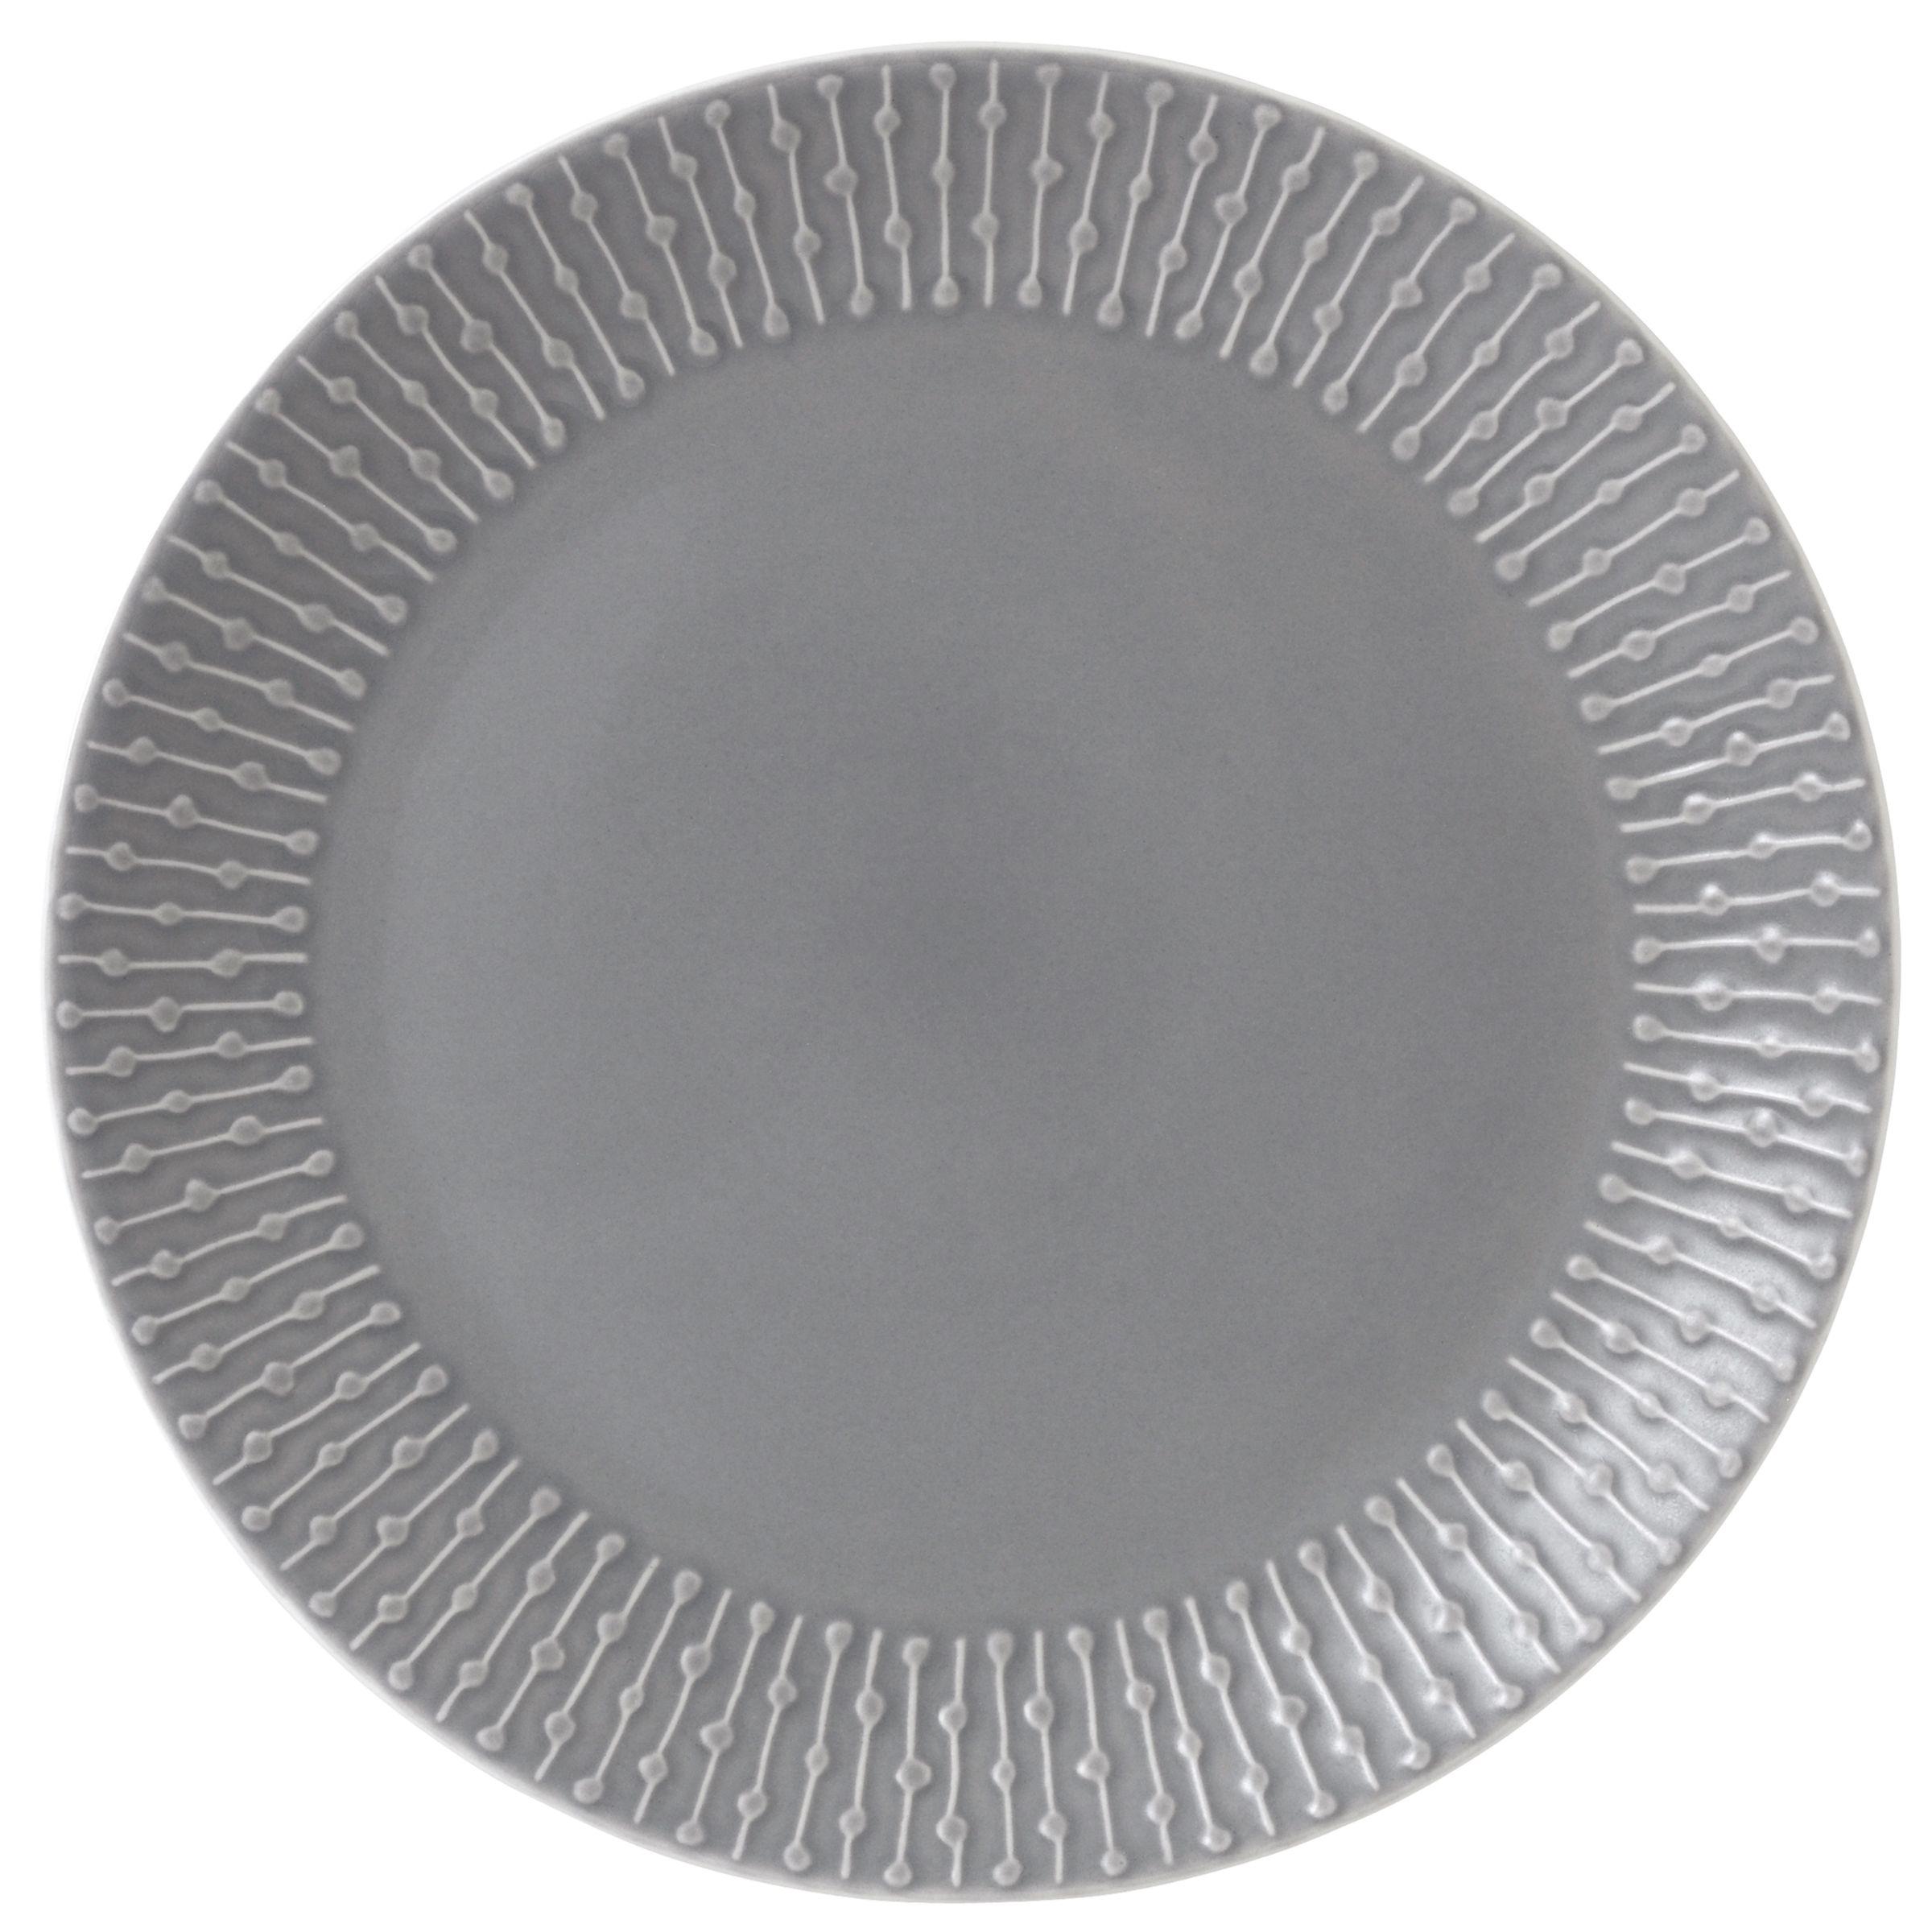 Royal Doulton HemingwayDesign for Royal Doulton 28.5cm Side Plate